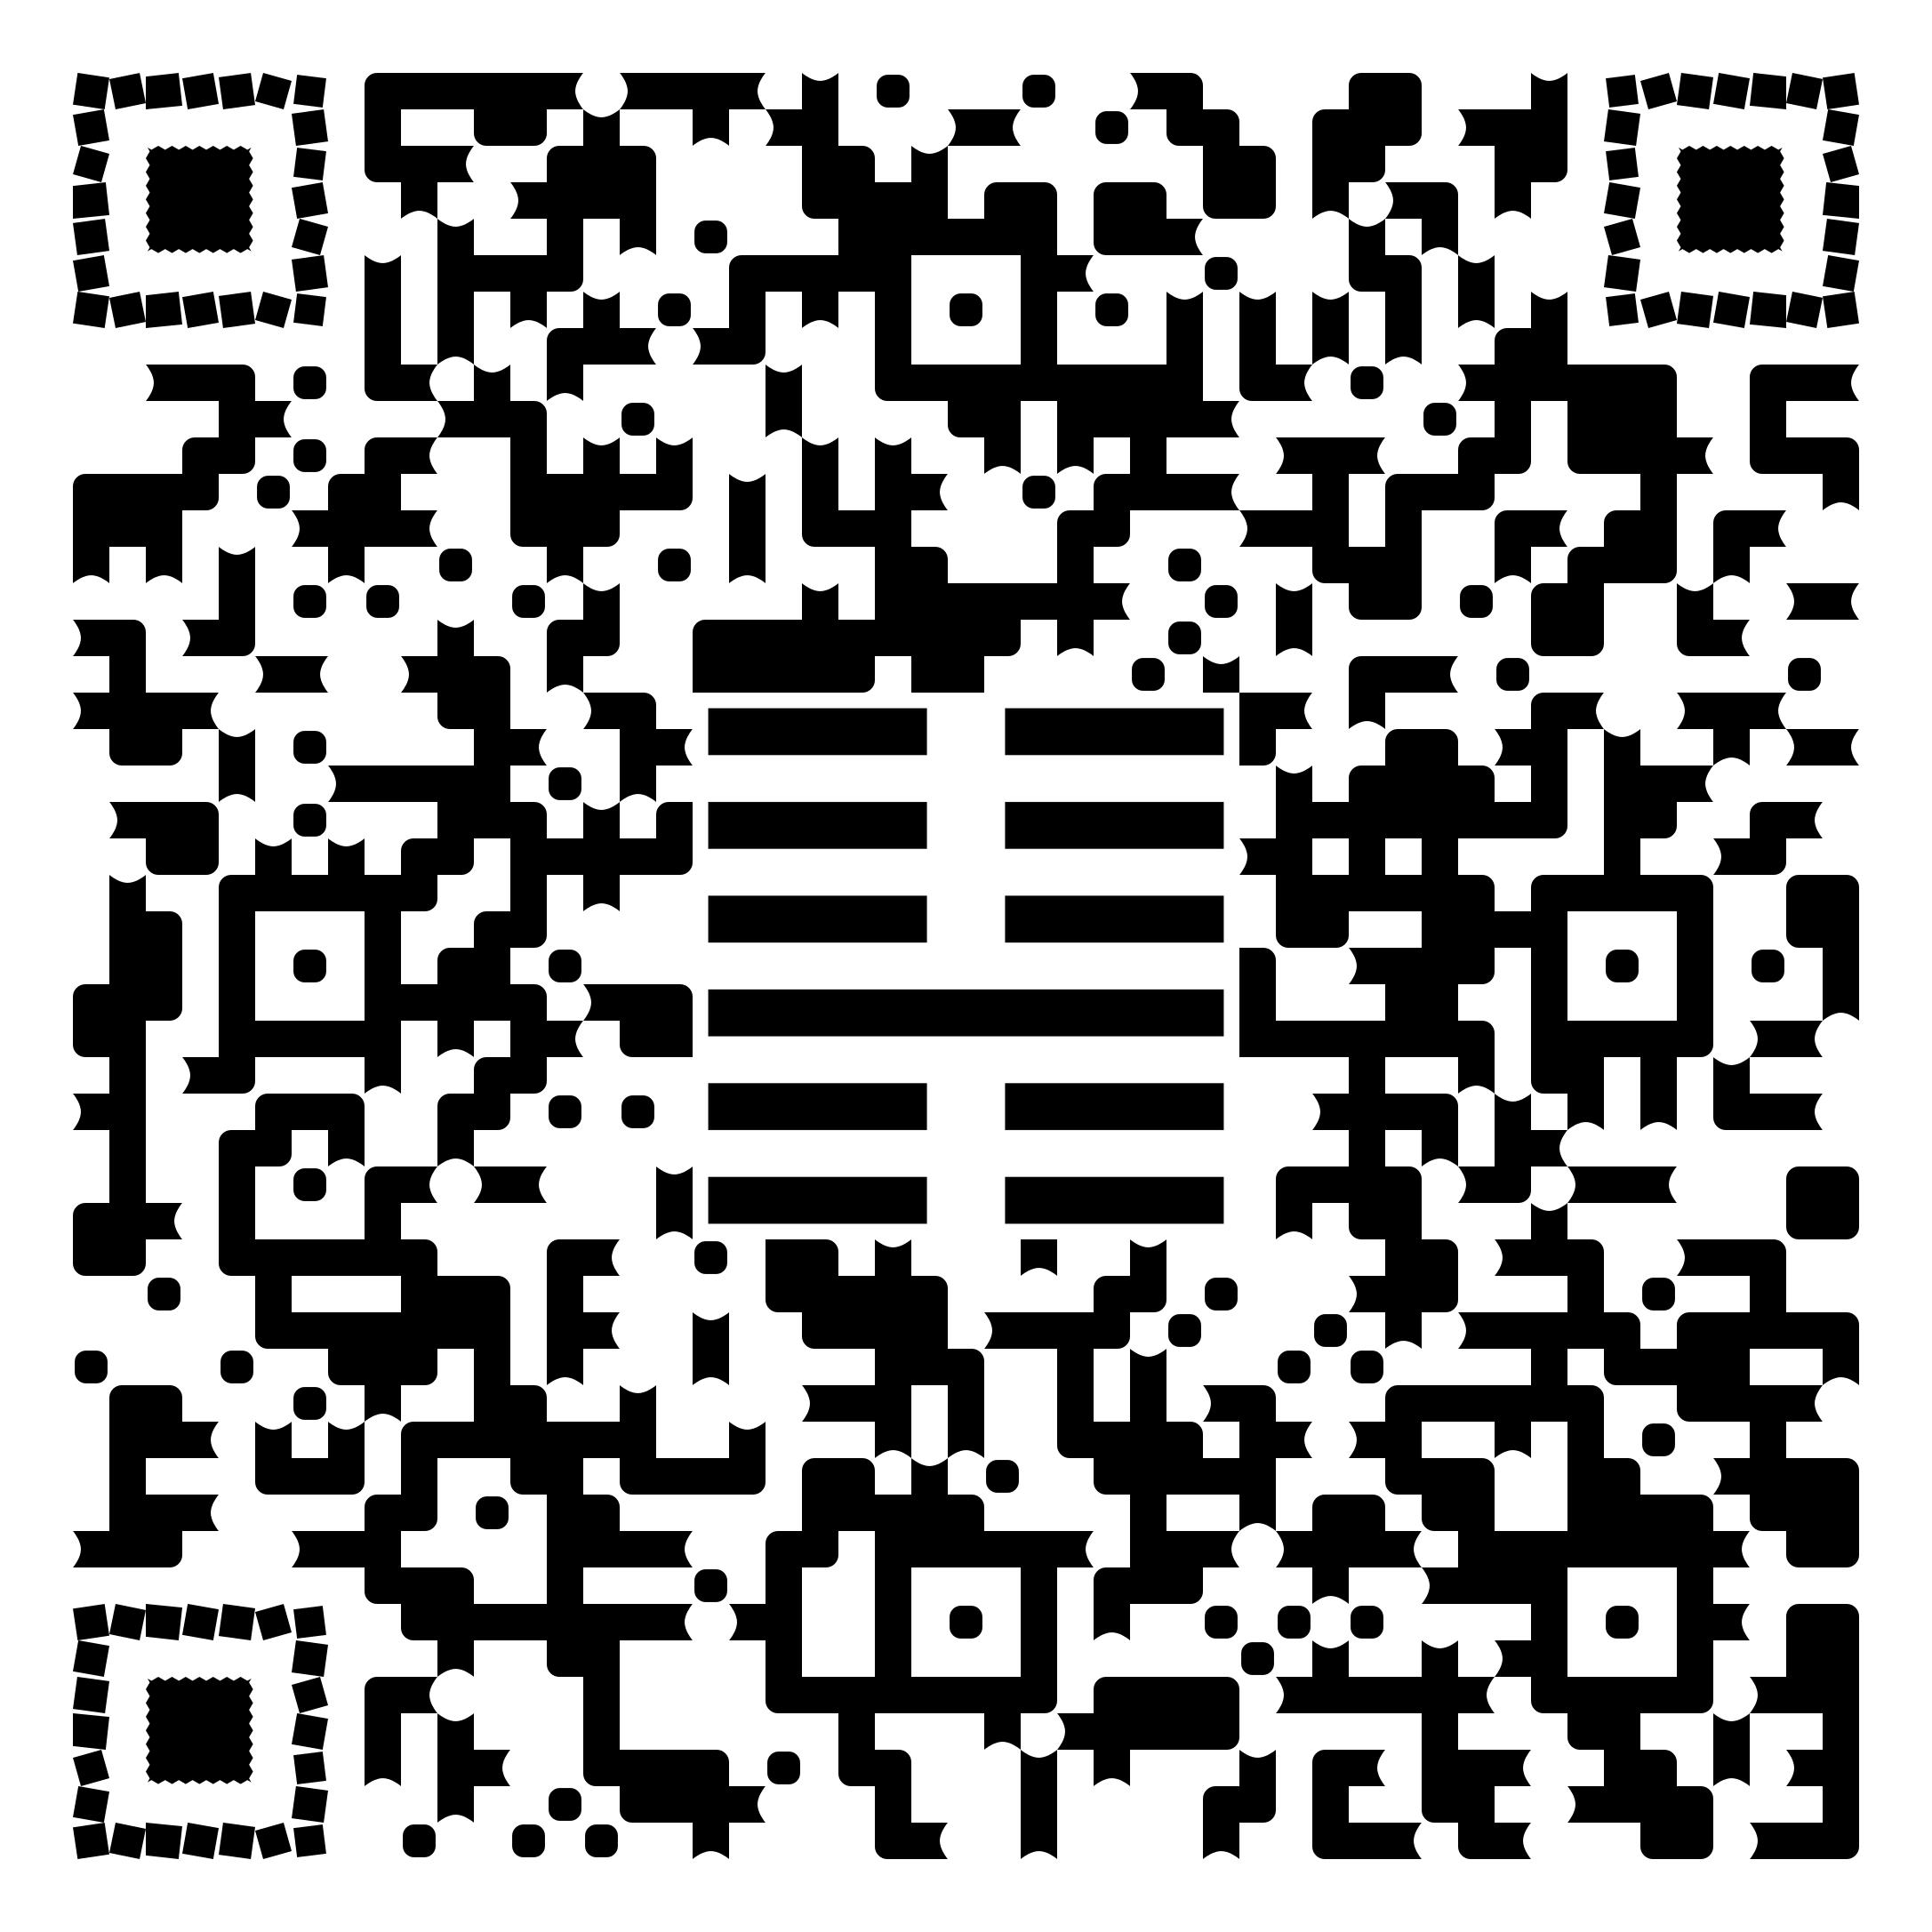 qr-code-15.png